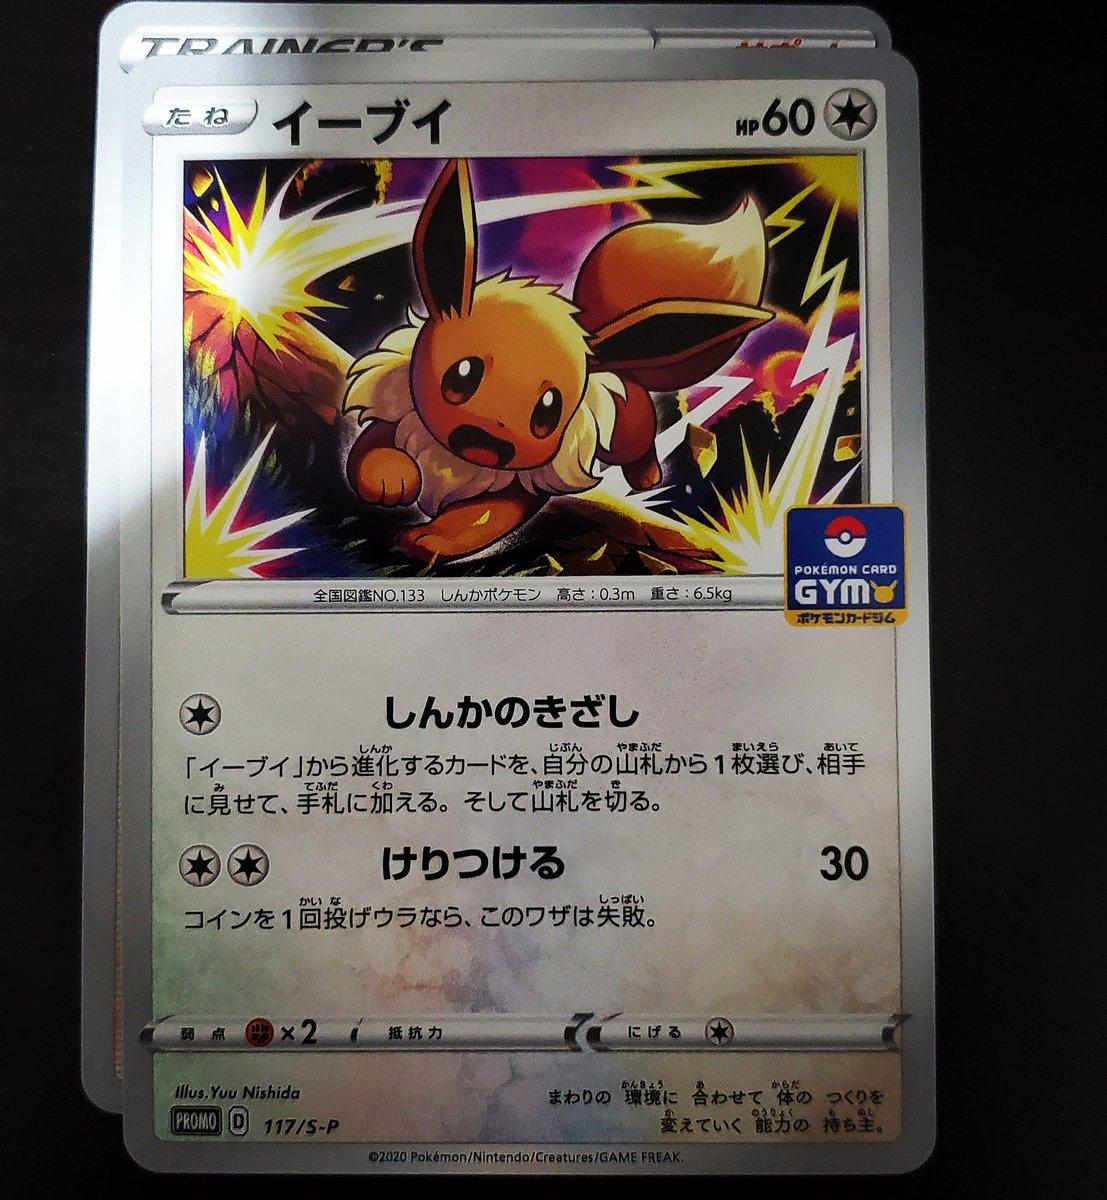 #pikachu #pokemon #pokemongo #nintendo #pok #pokemoncards #charizard #pokemoncommunity #mon  #bhfyp #tcgディスプレイコンテスト2020